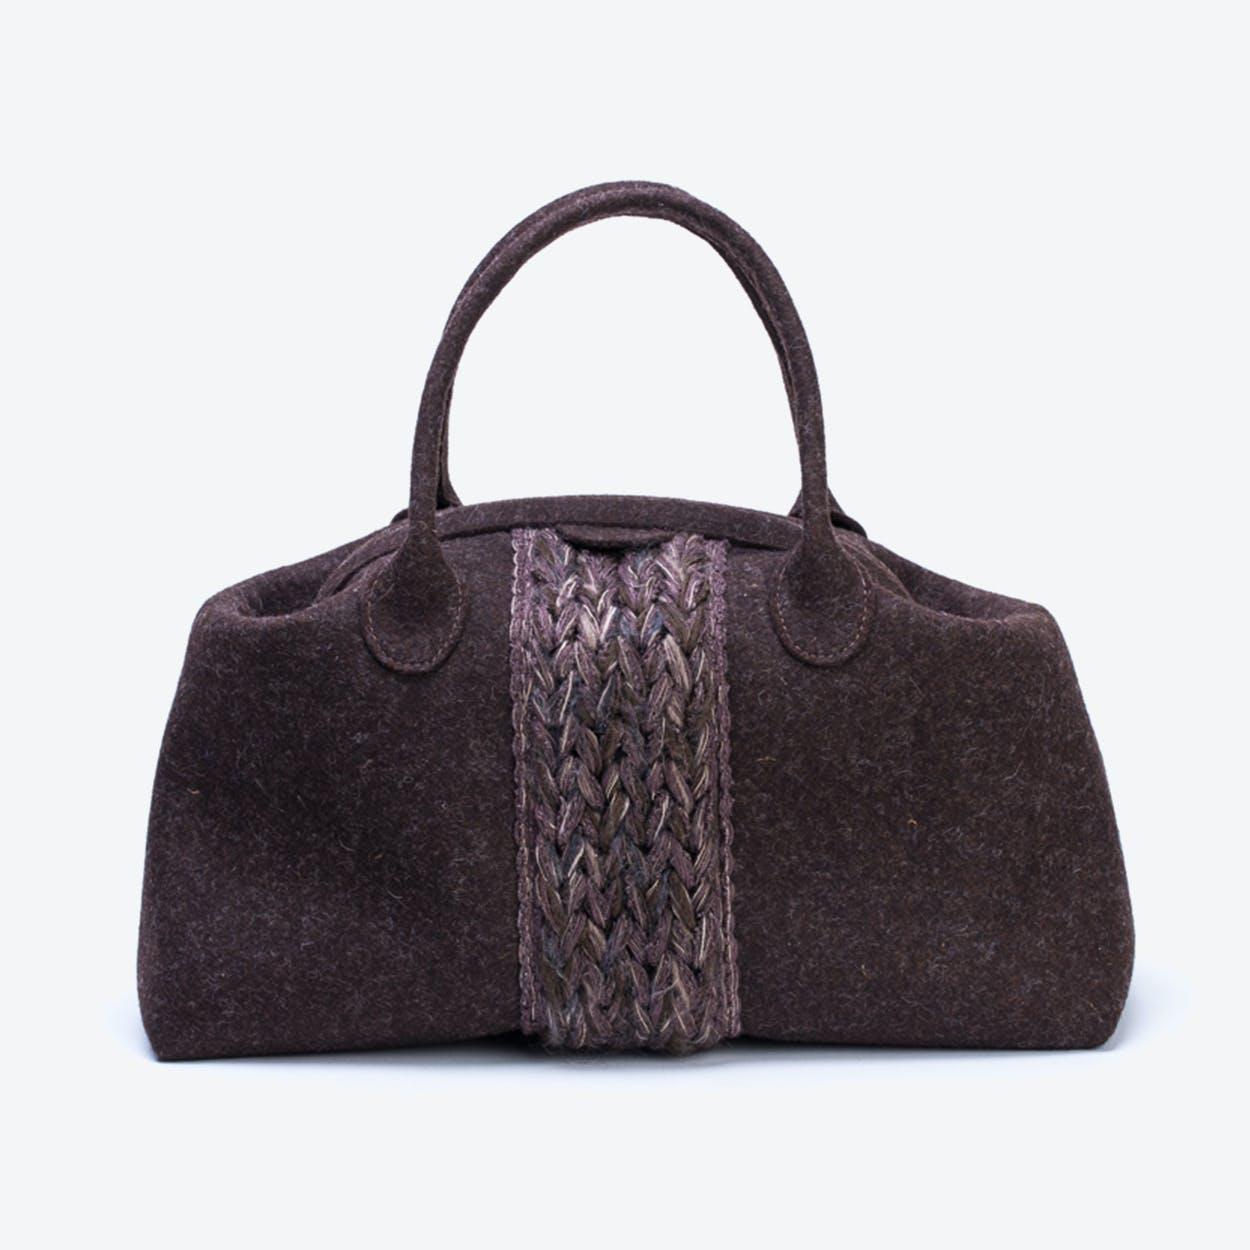 Plait Bag in Truffle Brown